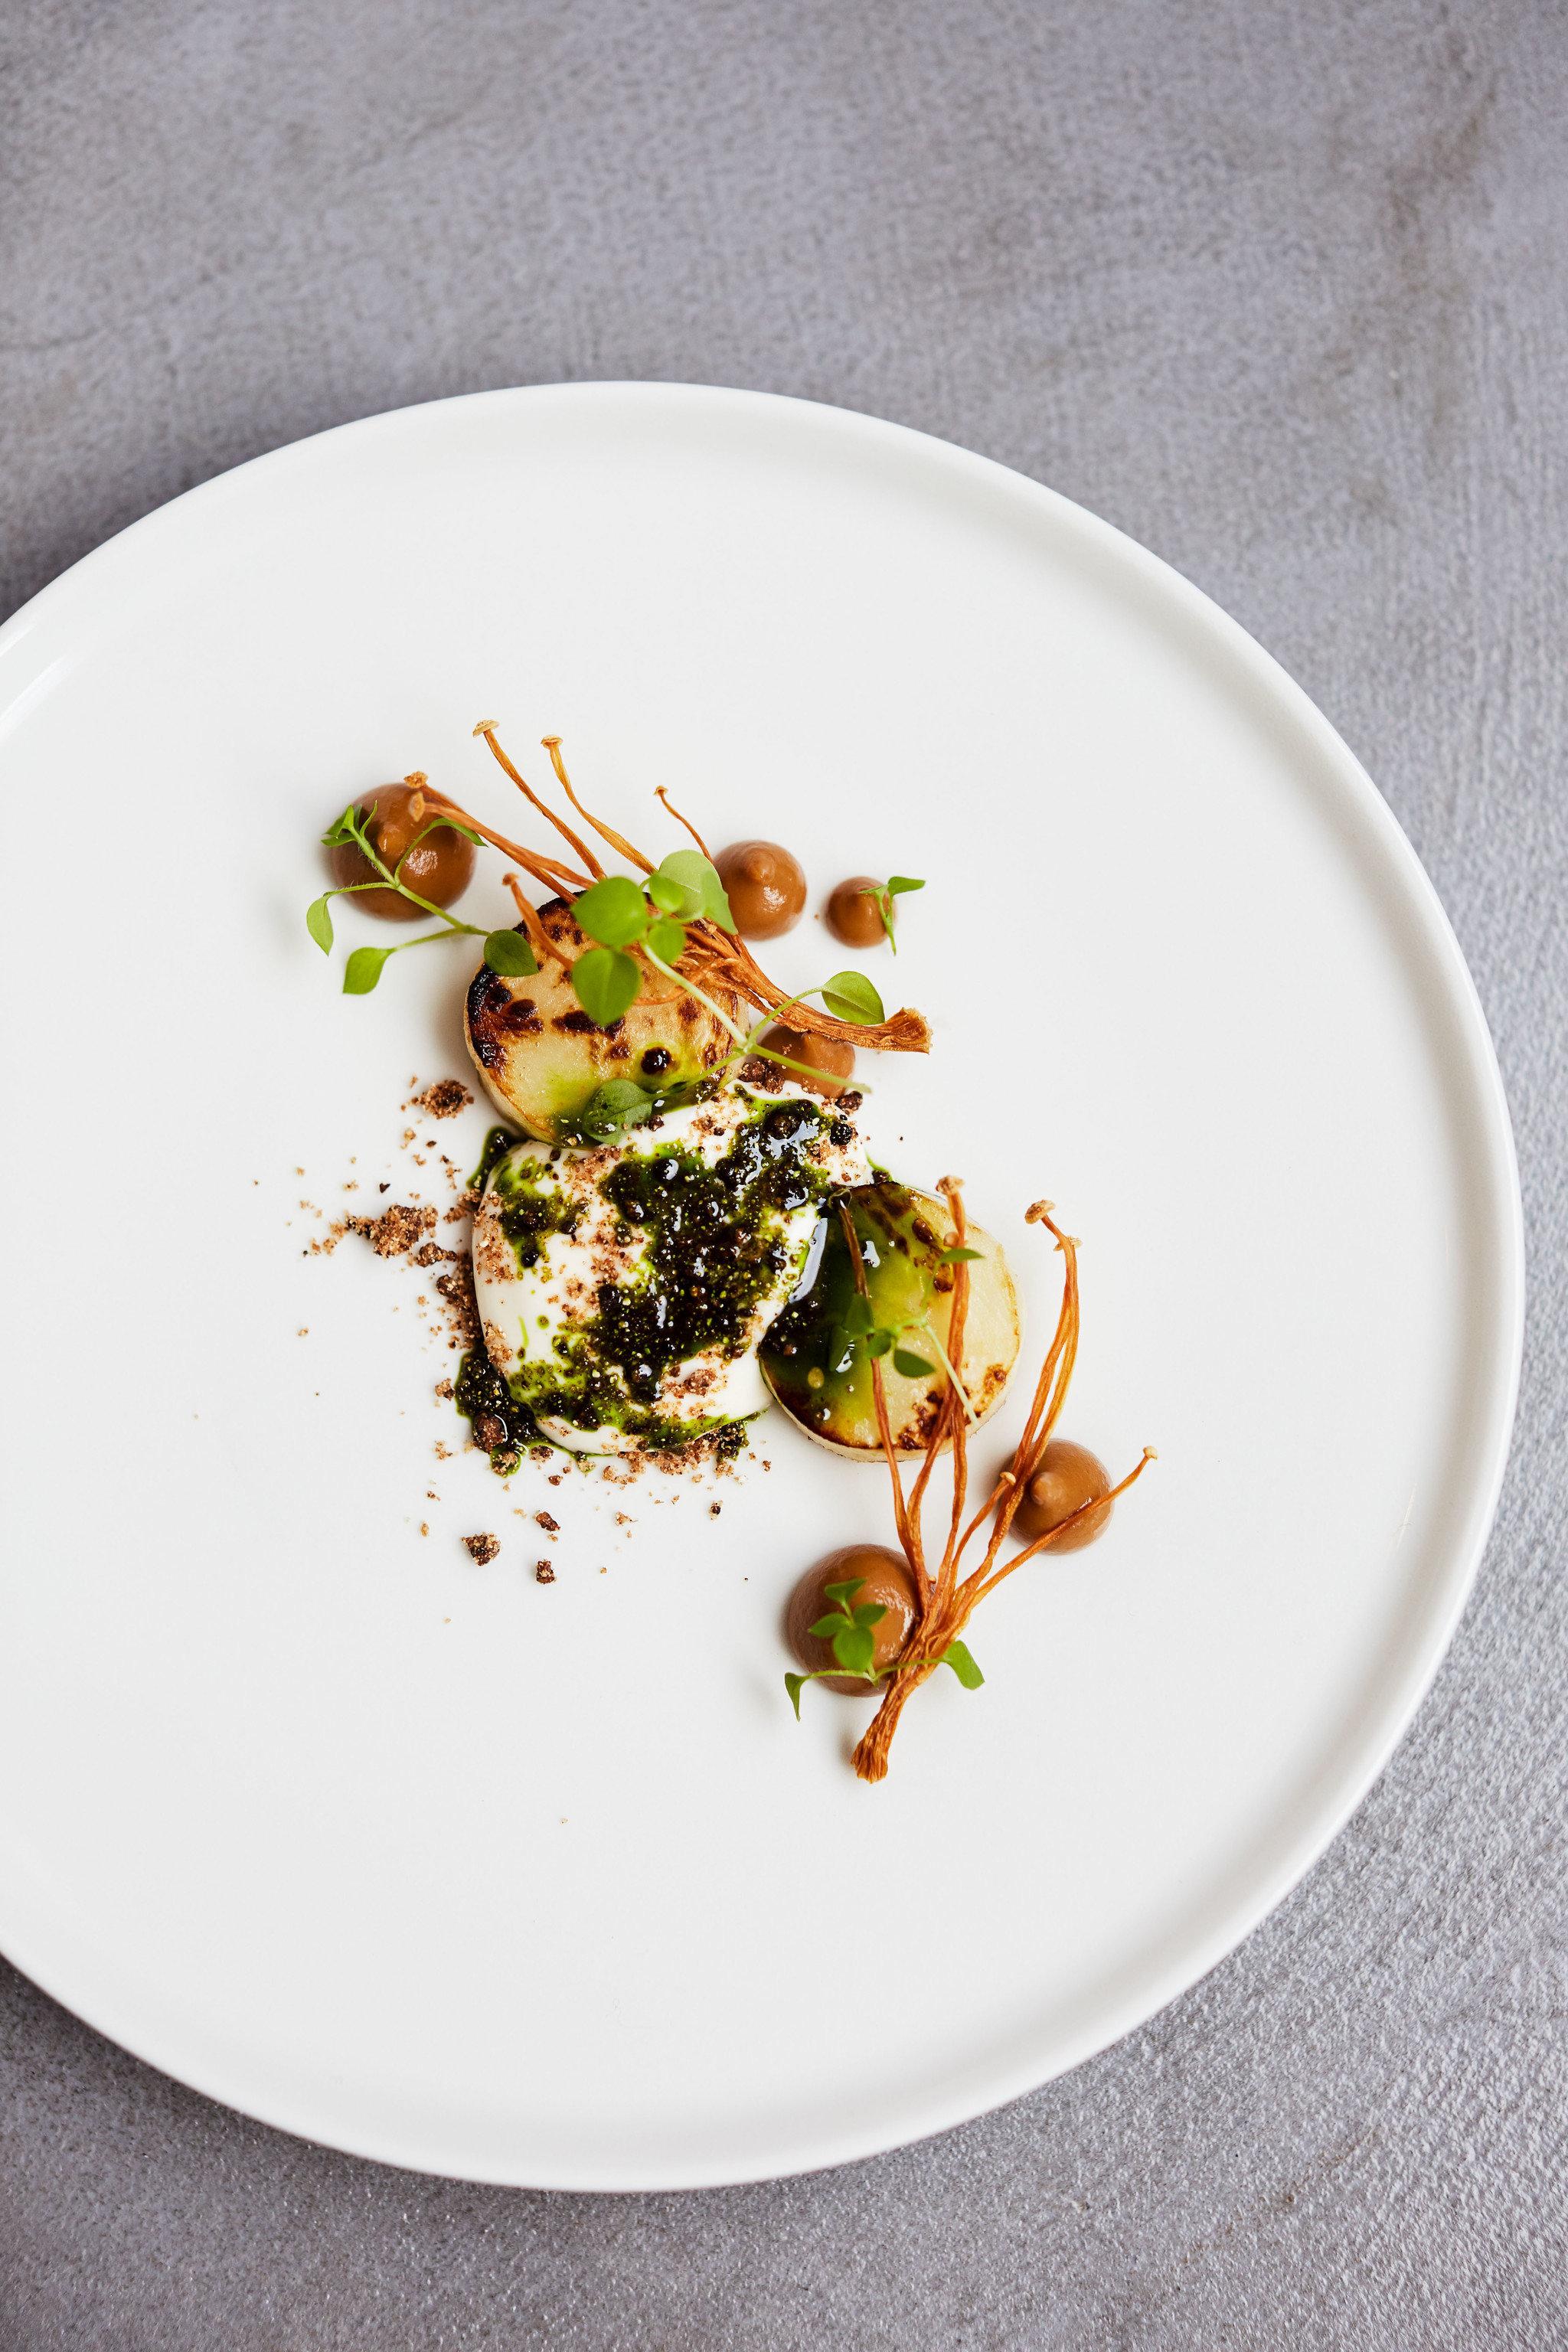 Food + Drink London plate food dish white dishware vegetarian food cuisine appetizer recipe dessert meal meat